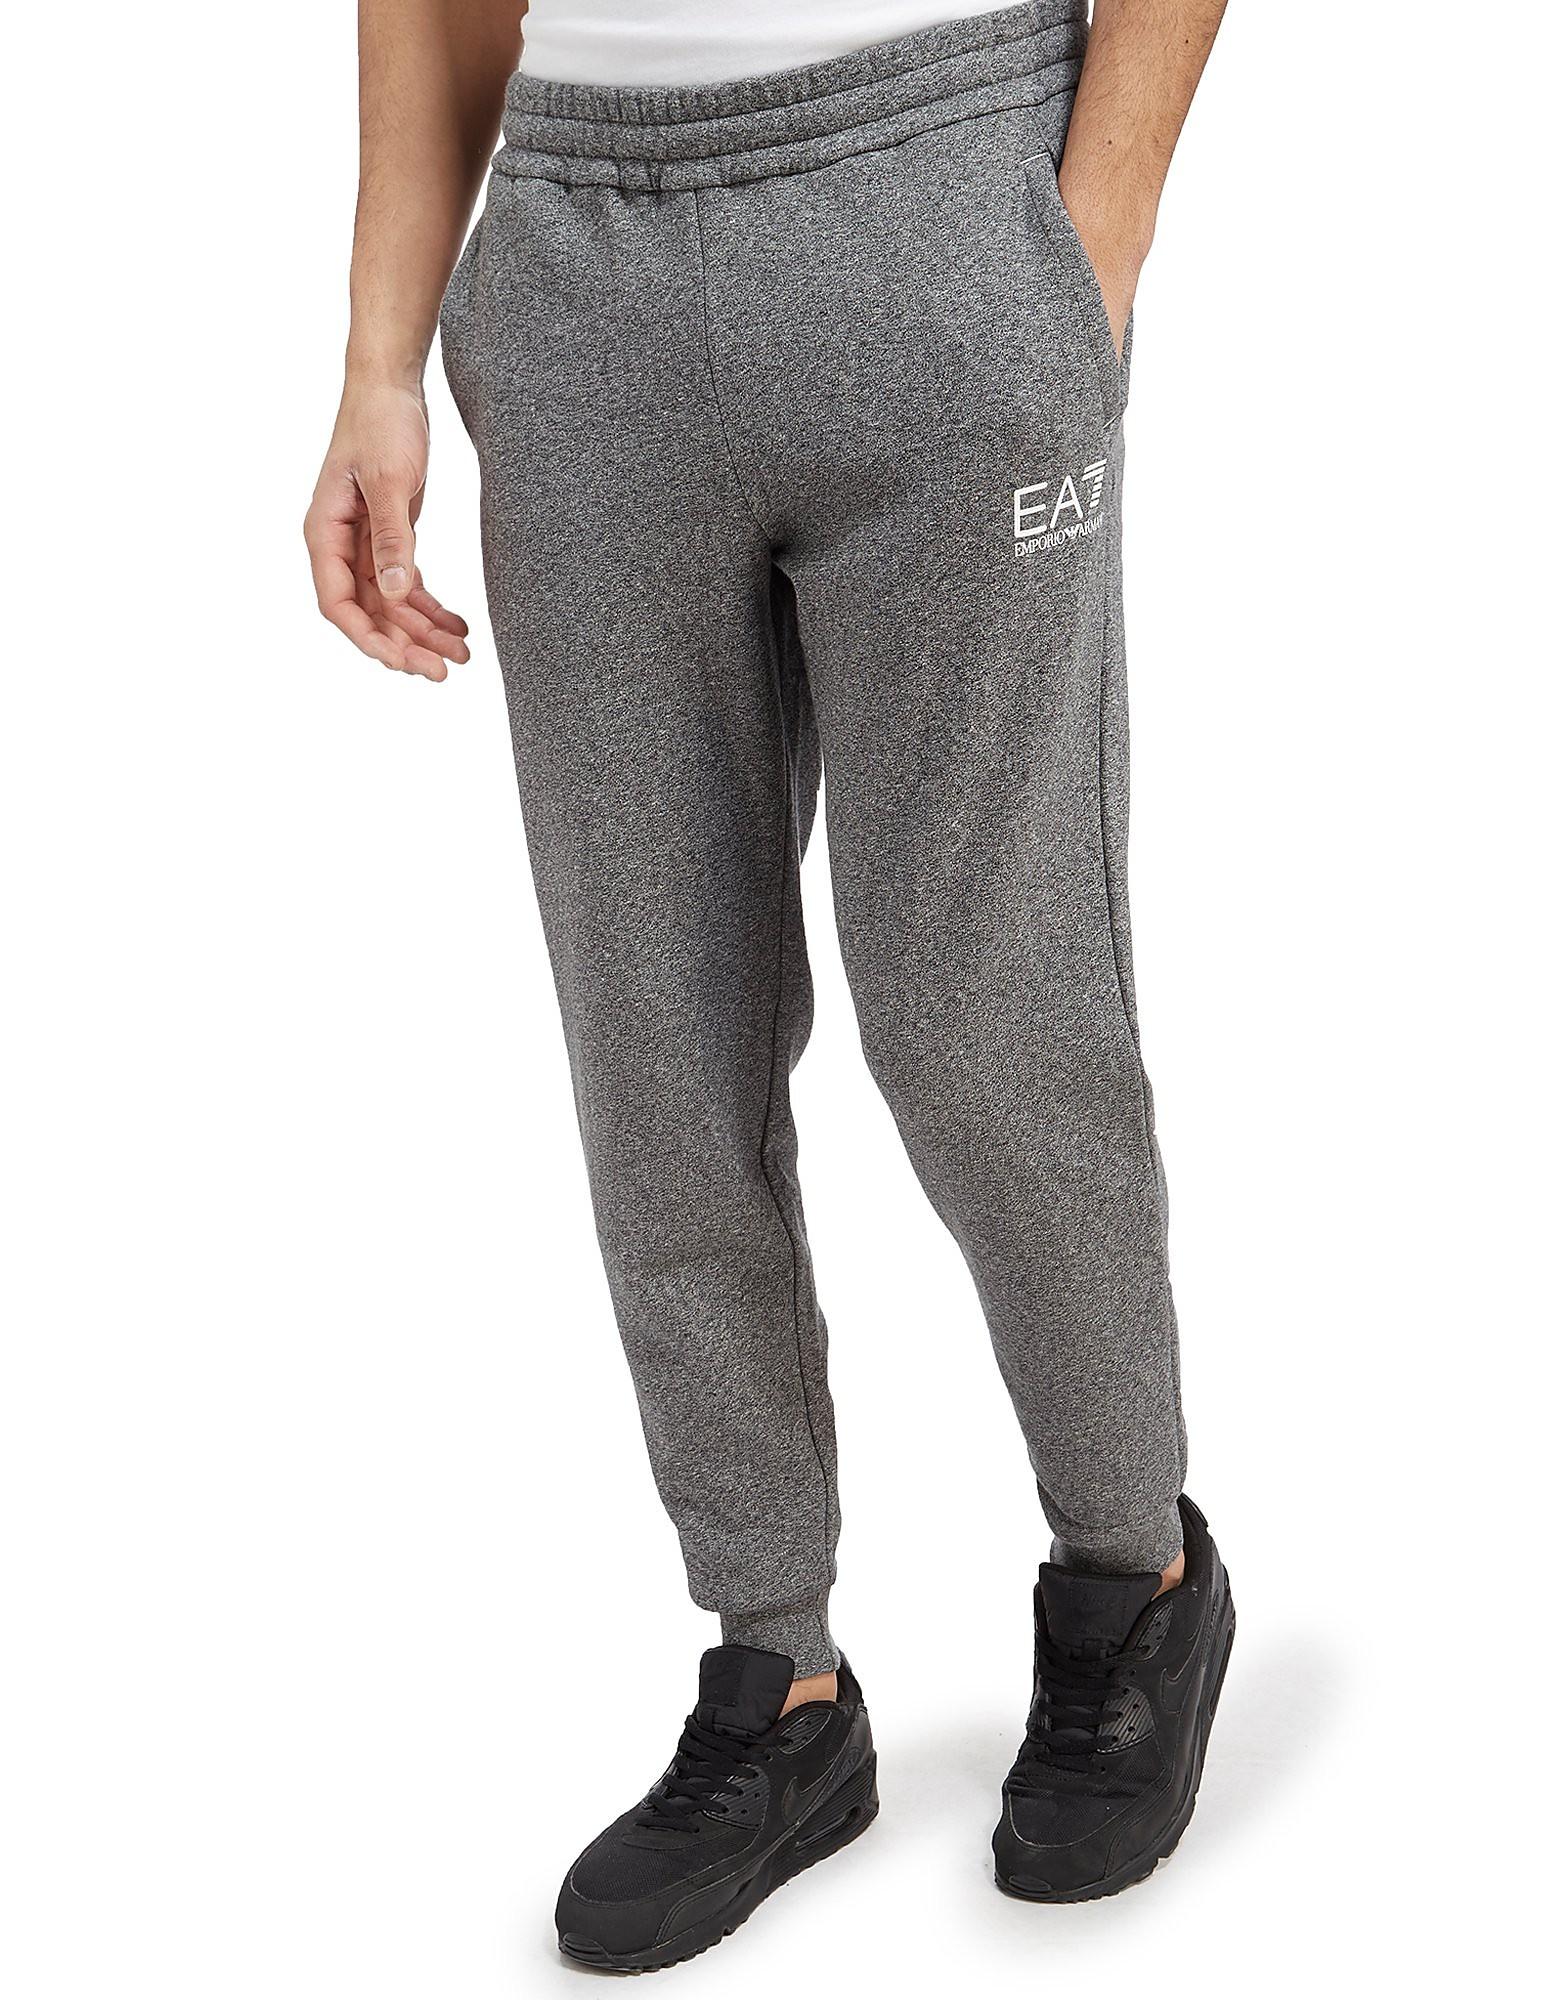 Emporio Armani EA7 Core Pants